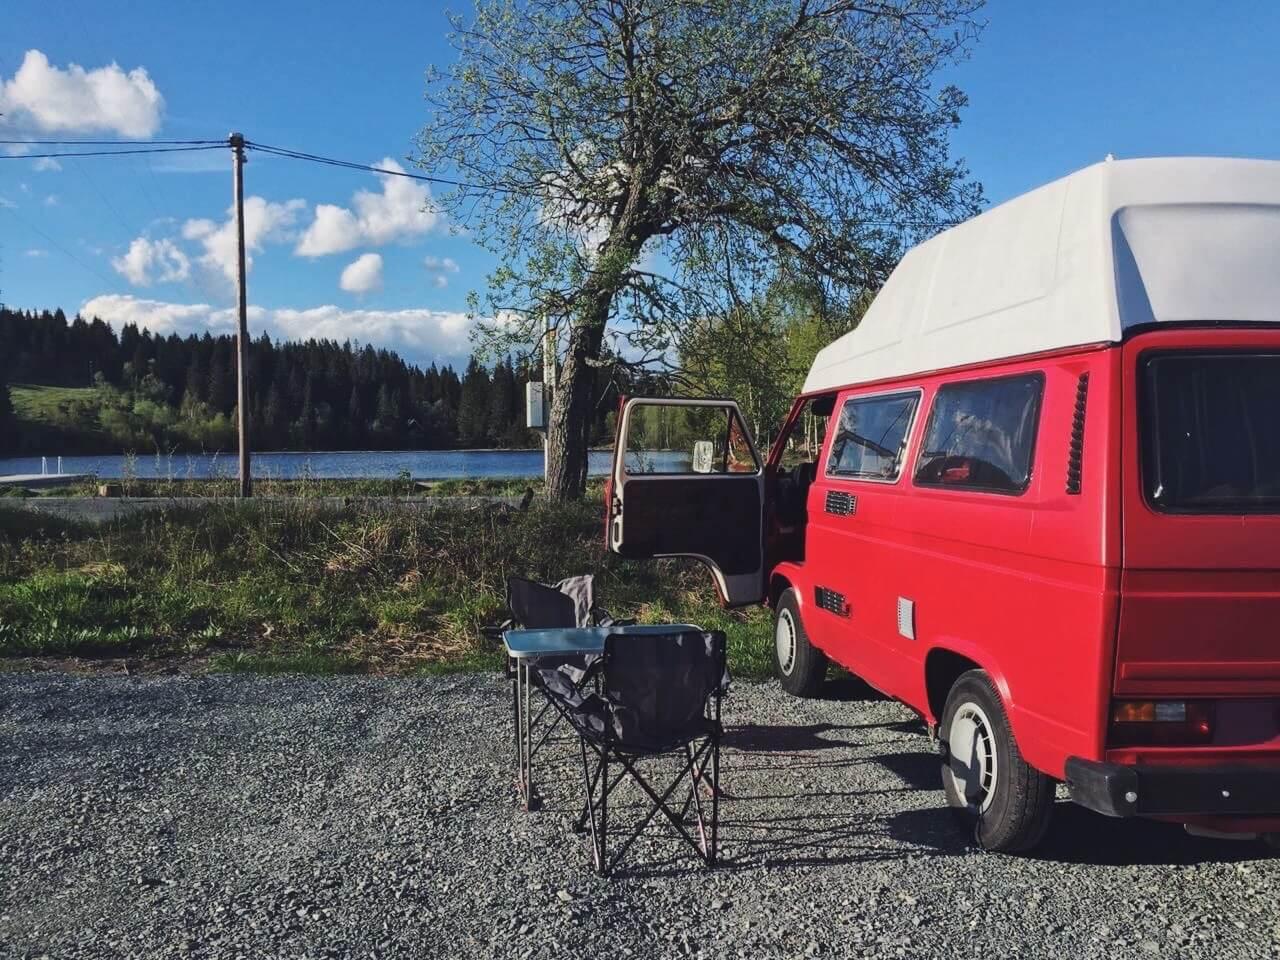 VW Bus T3 Helmut Reimo Hochdach rot Camper Bulli mieten Rostock bincampen Dänemark Urlaub Ferien Natur Pause